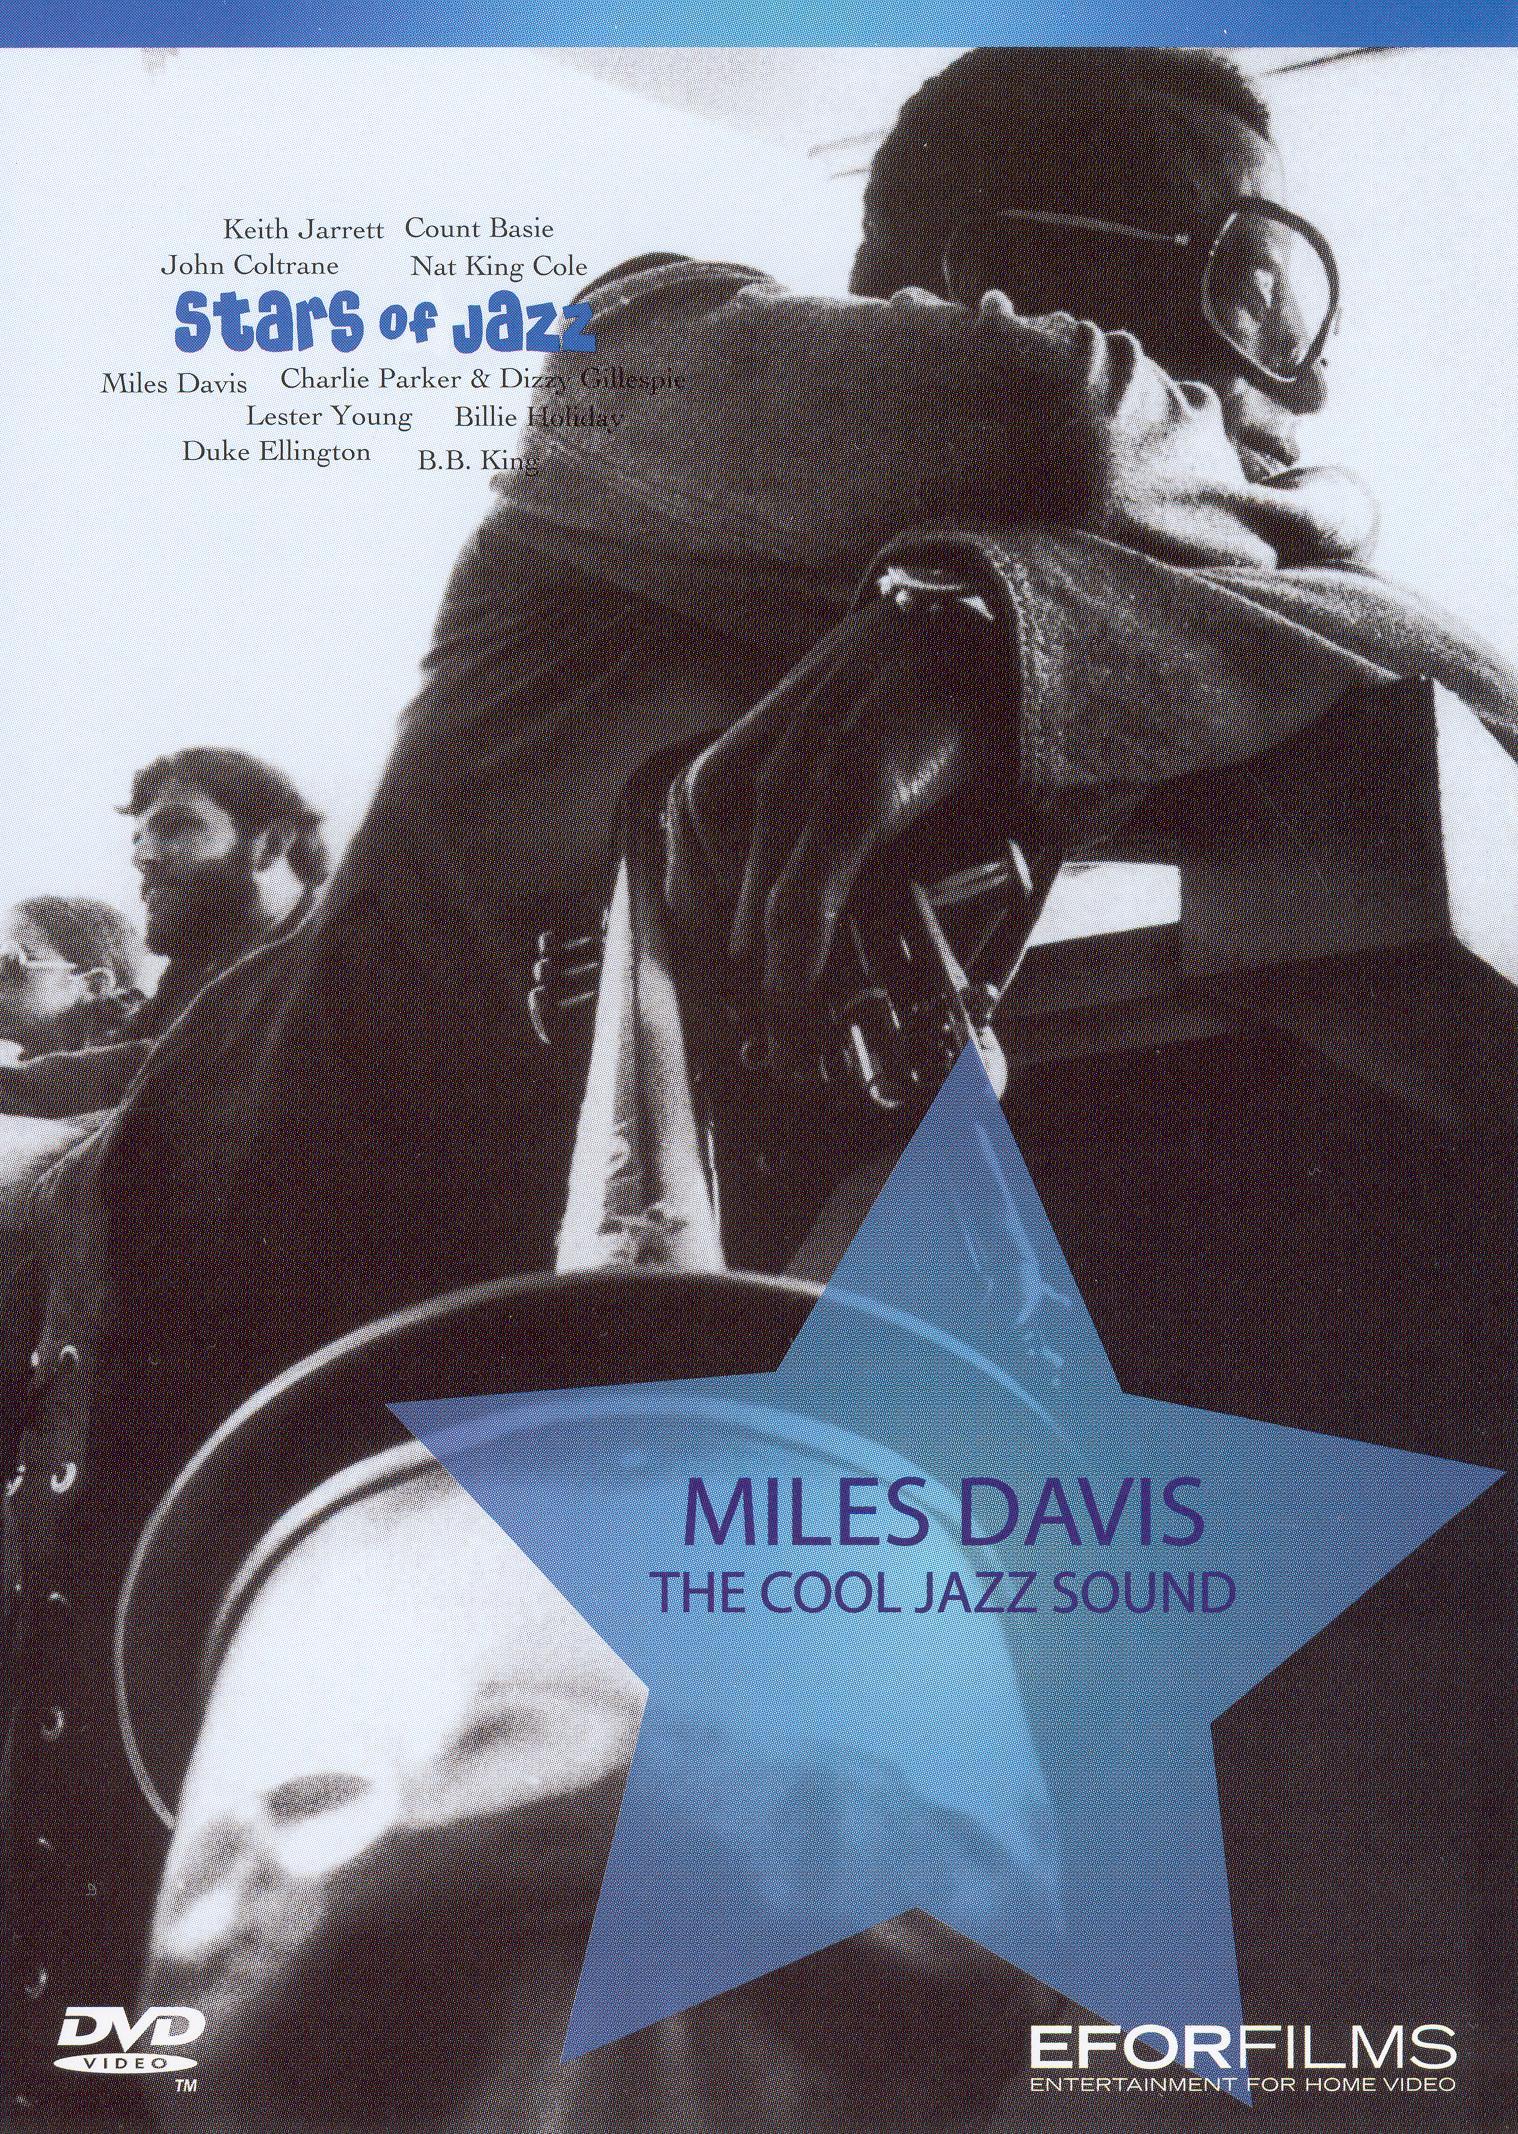 Miles Davis: The Cool Jazz Sound